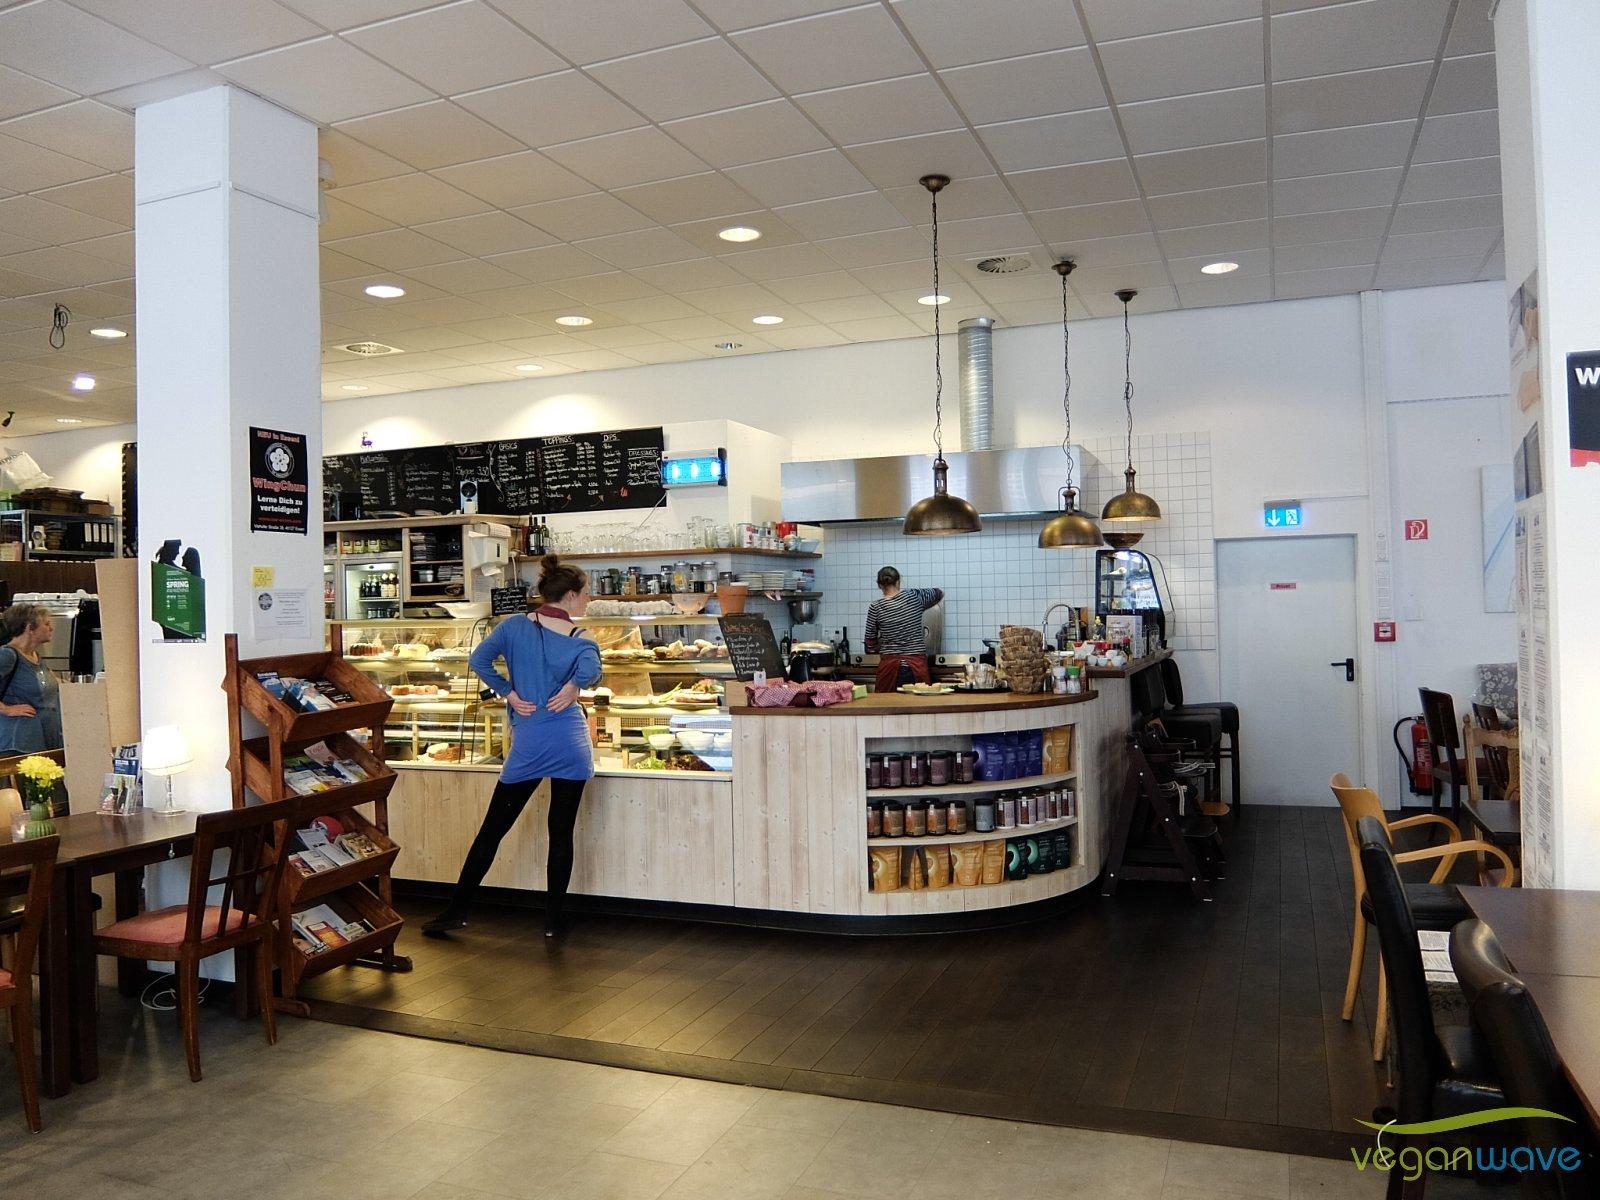 Café Konsumreform